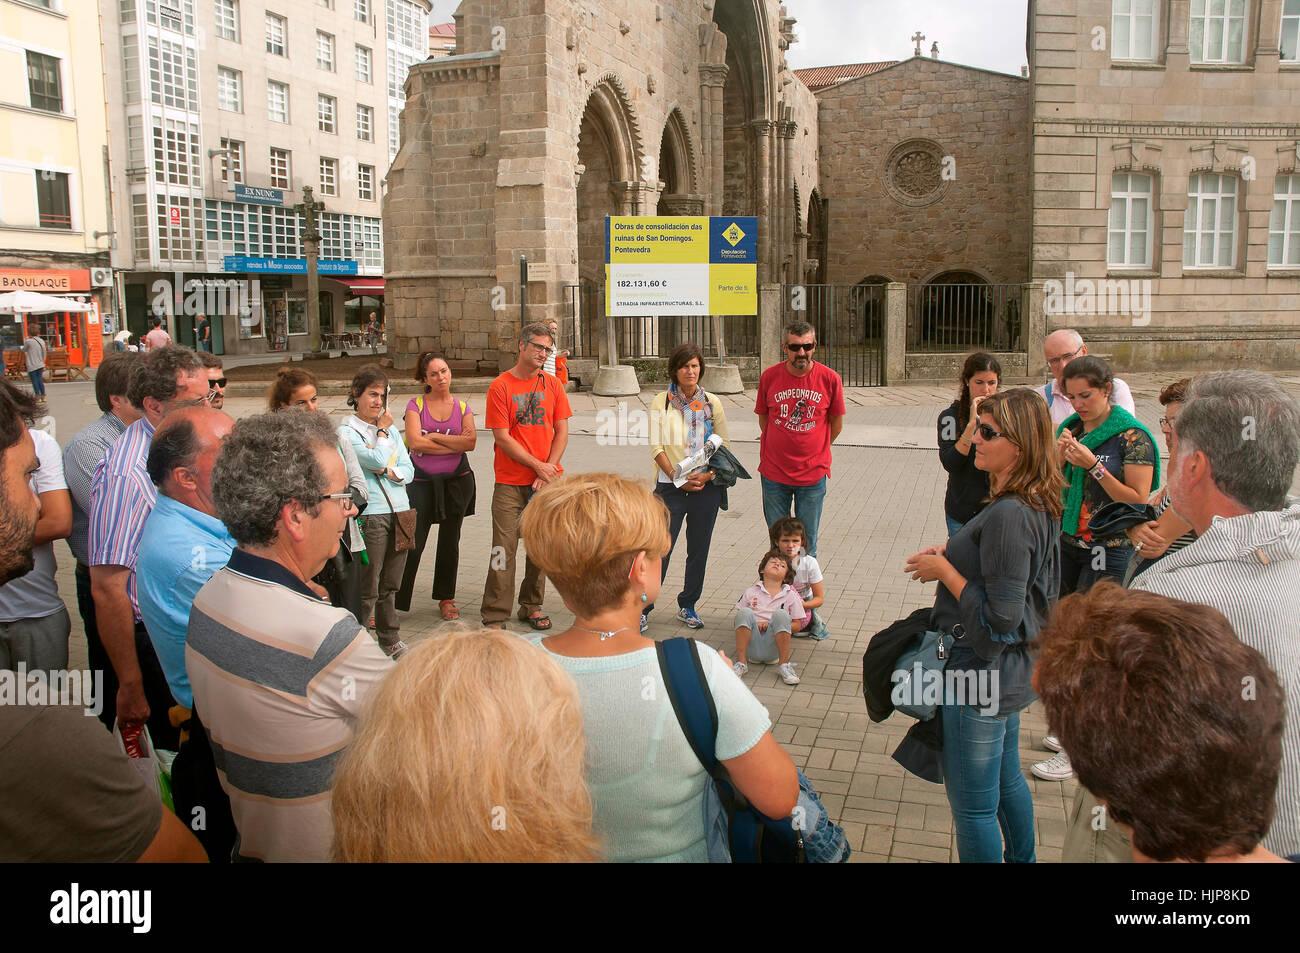 Guided tour in the Plaza de España, Ruins of the church of Santo Domingo - 14th century, Pontevedra, Region - Stock Image